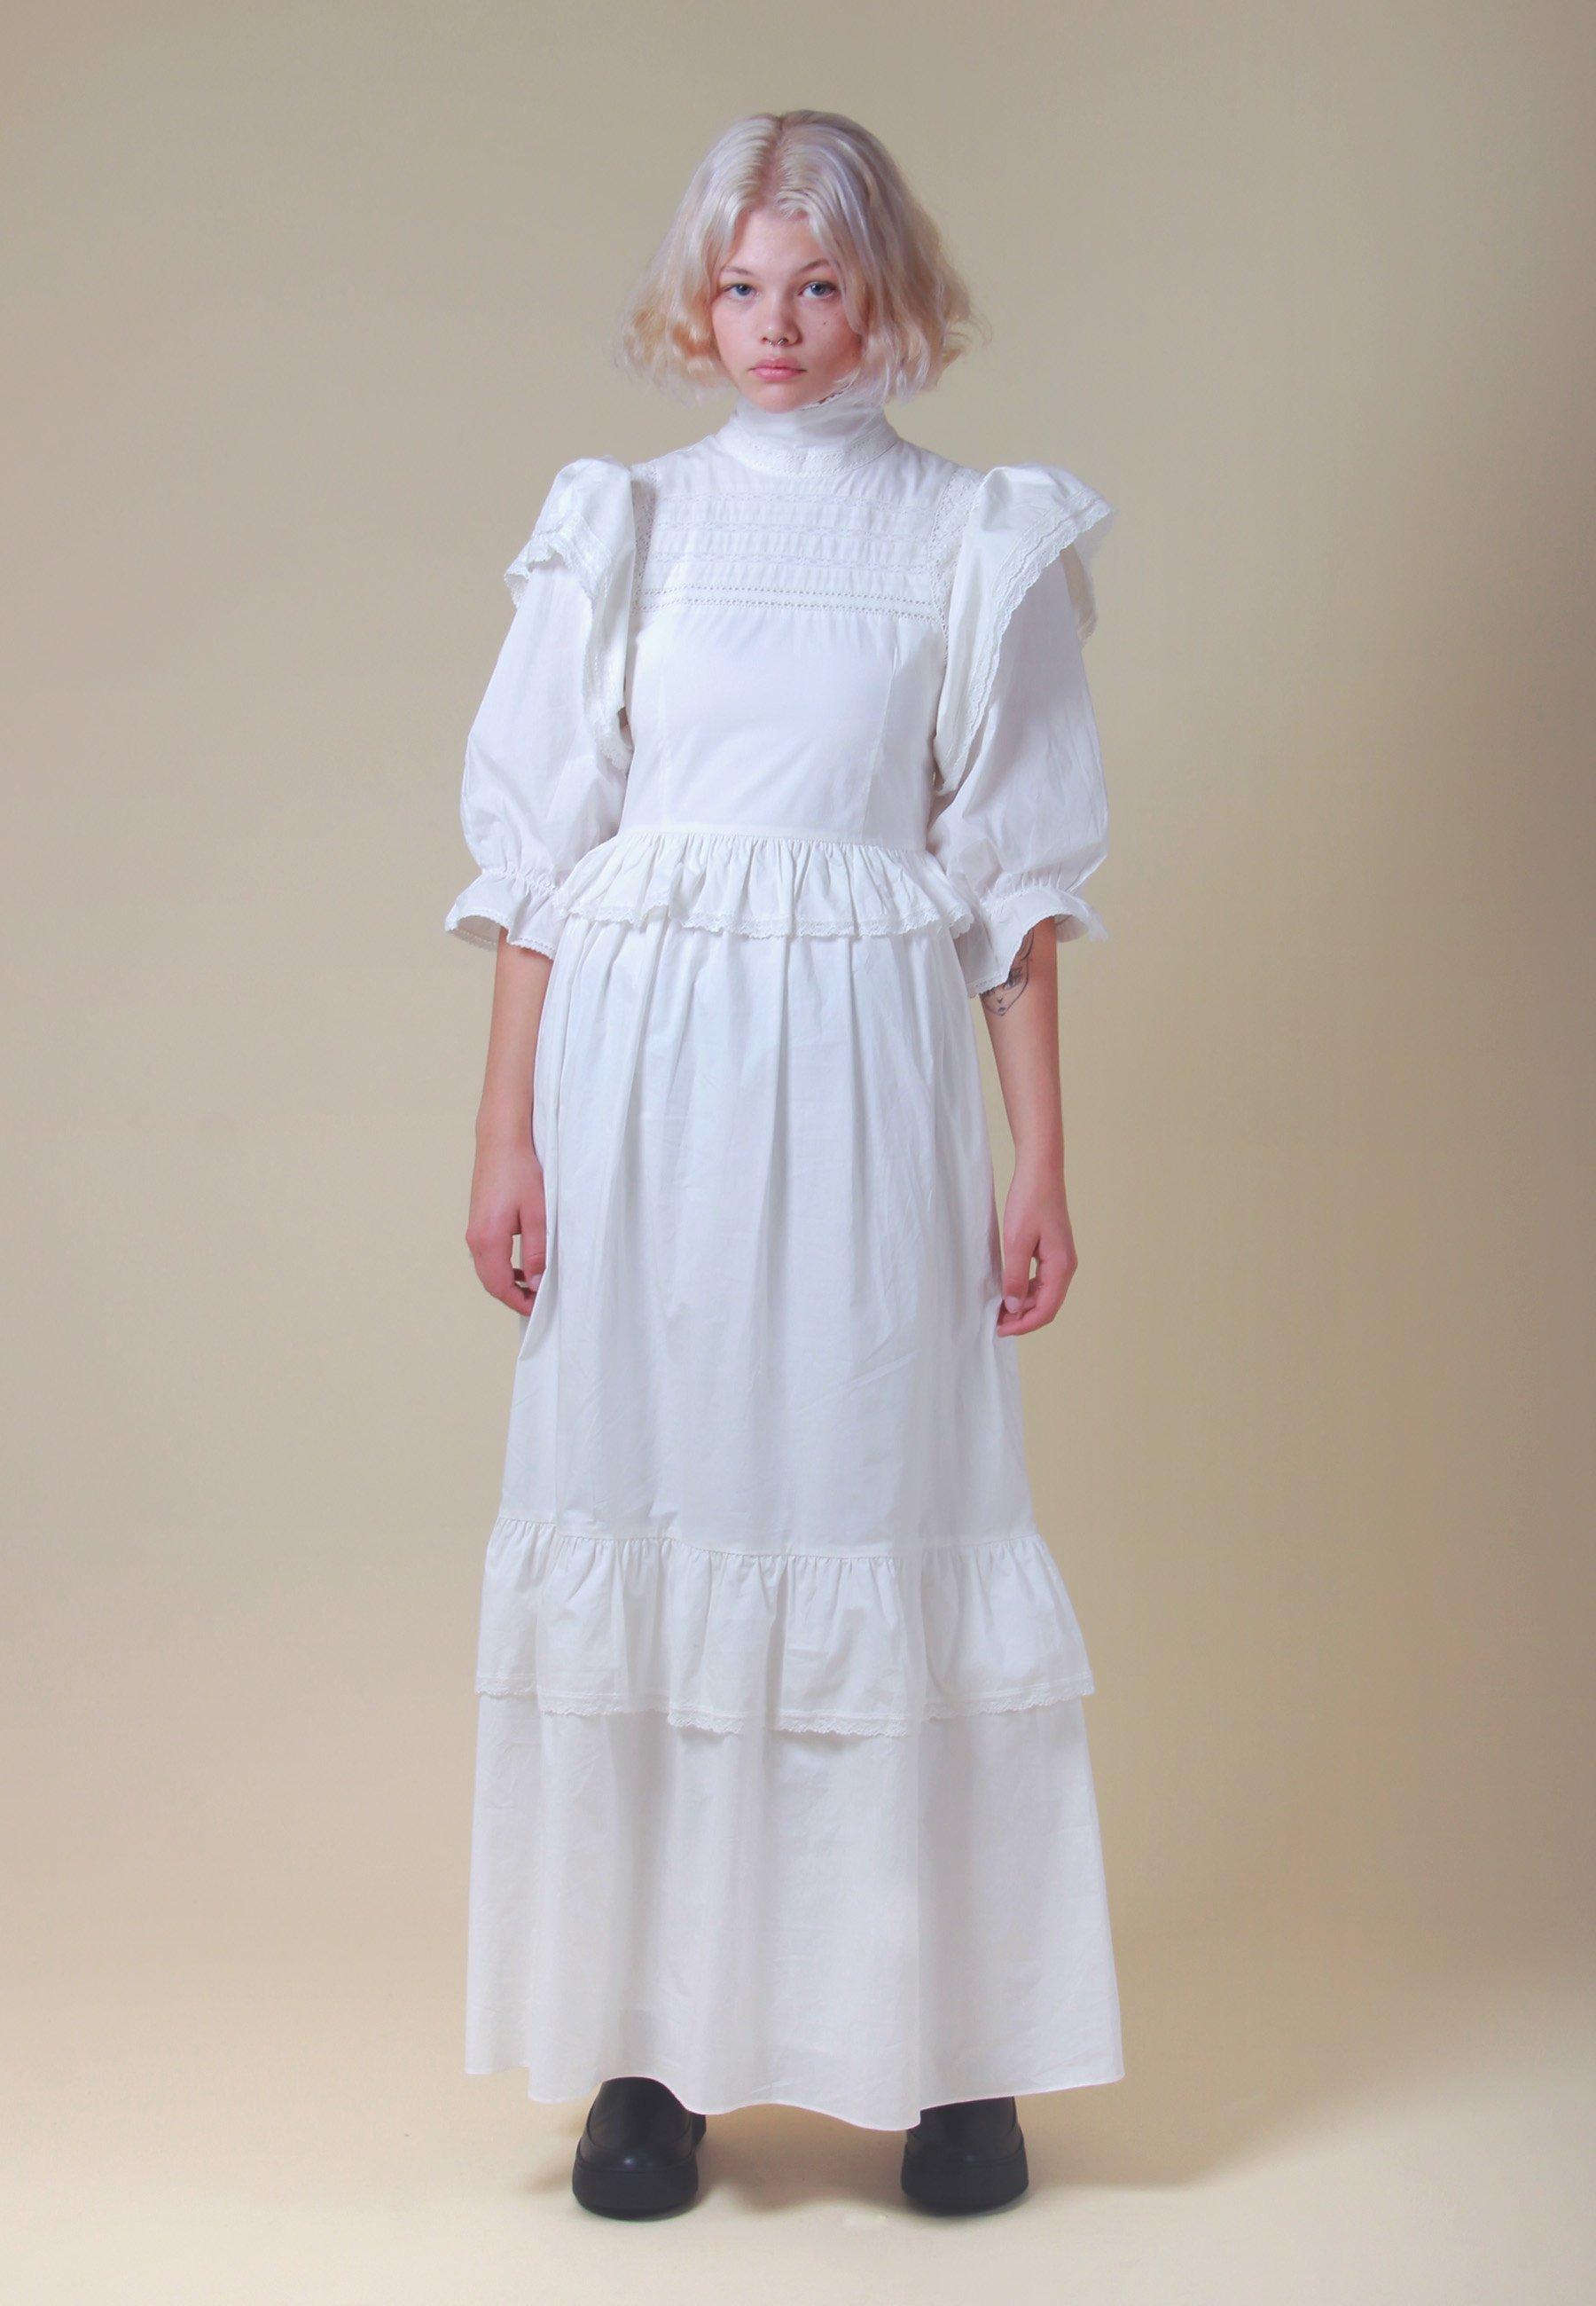 1900s Edwardian Dresses, 1910s Dresses Meadows Bellflower Dress - white $378.00 AT vintagedancer.com